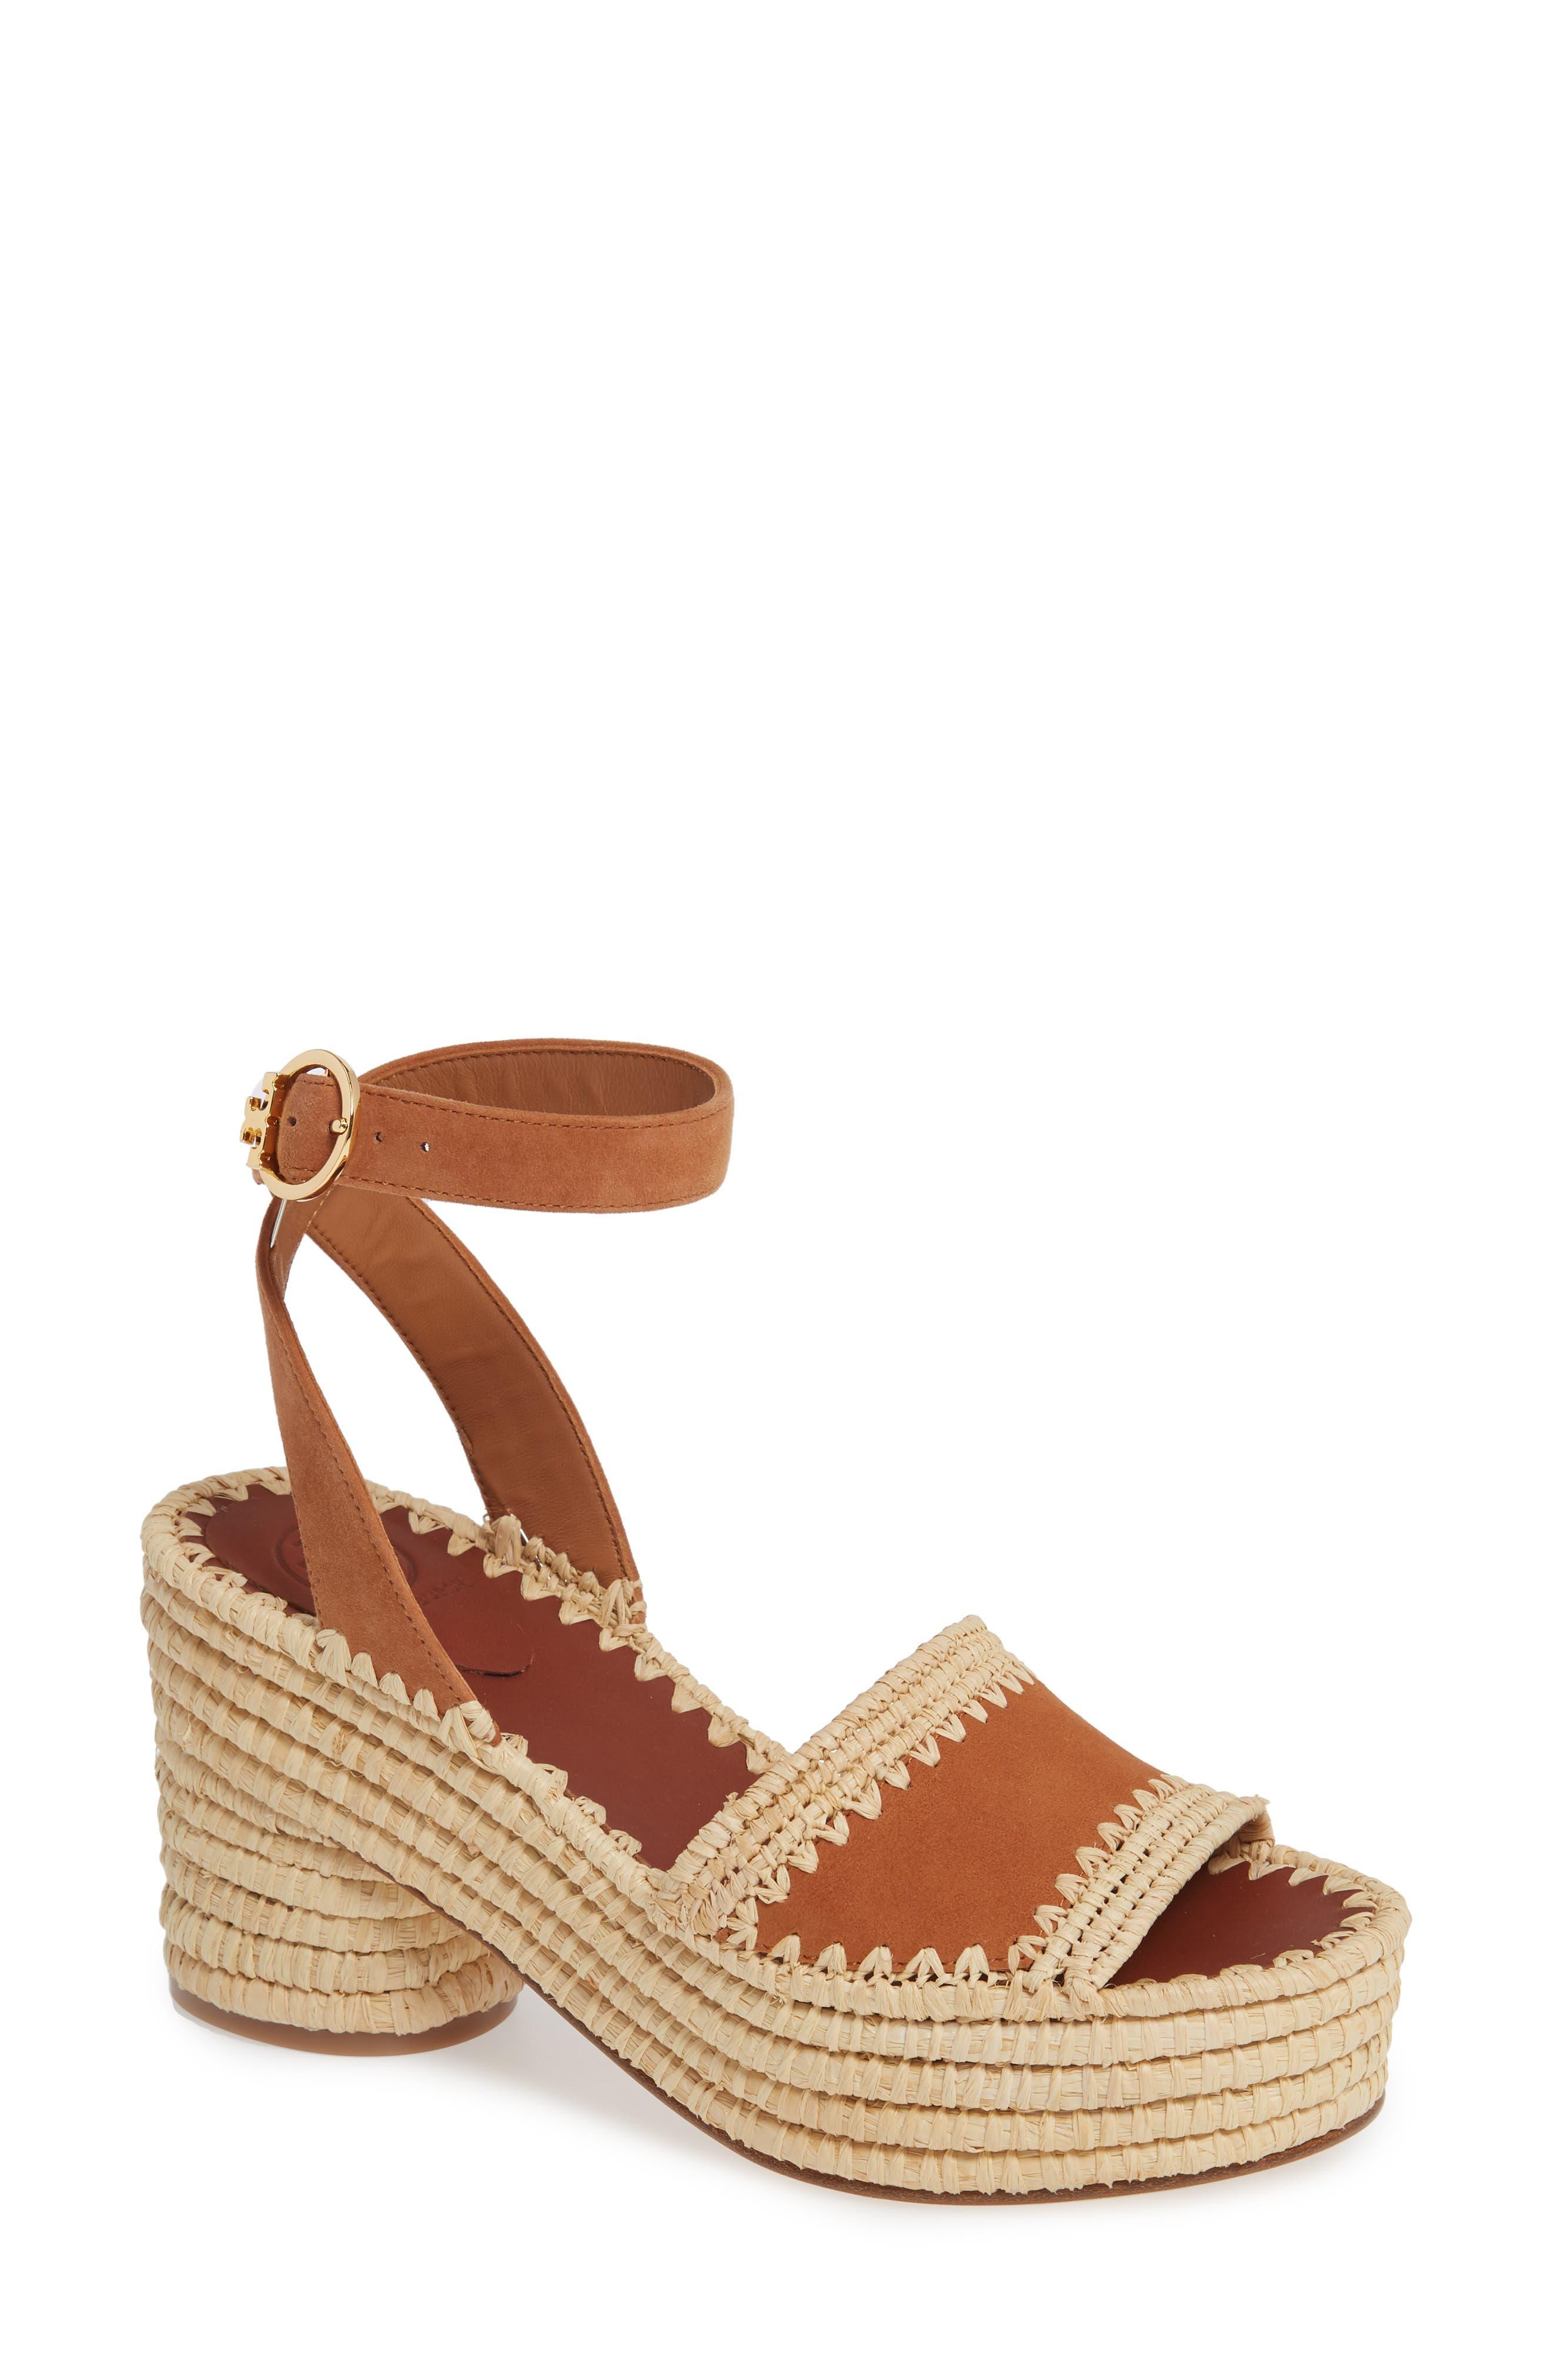 Tory Burch Arianne Platform Ankle Strap Sandal, Brown